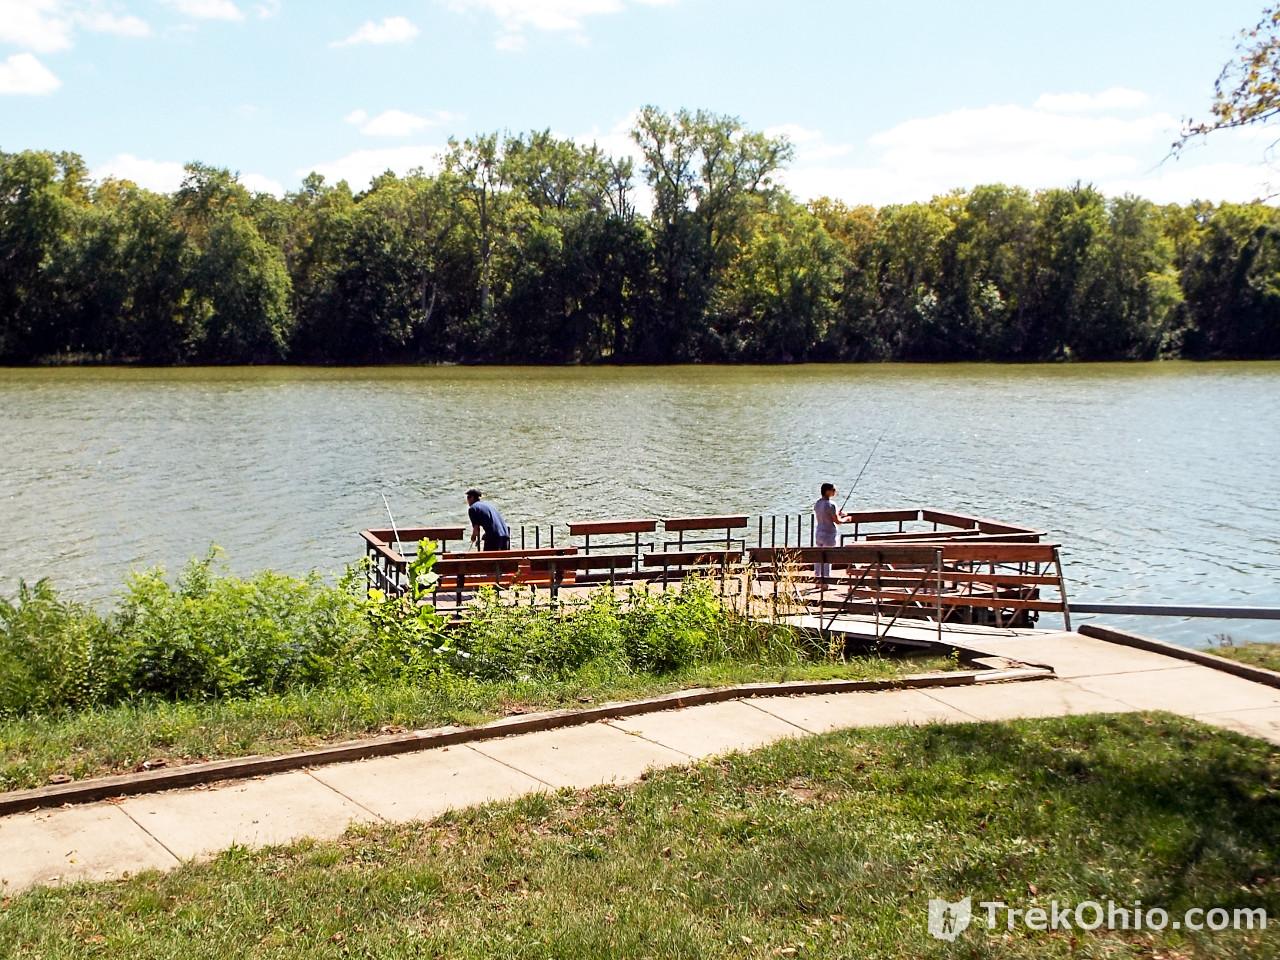 Farnsworth metropark trekohio for Fishing docks near me